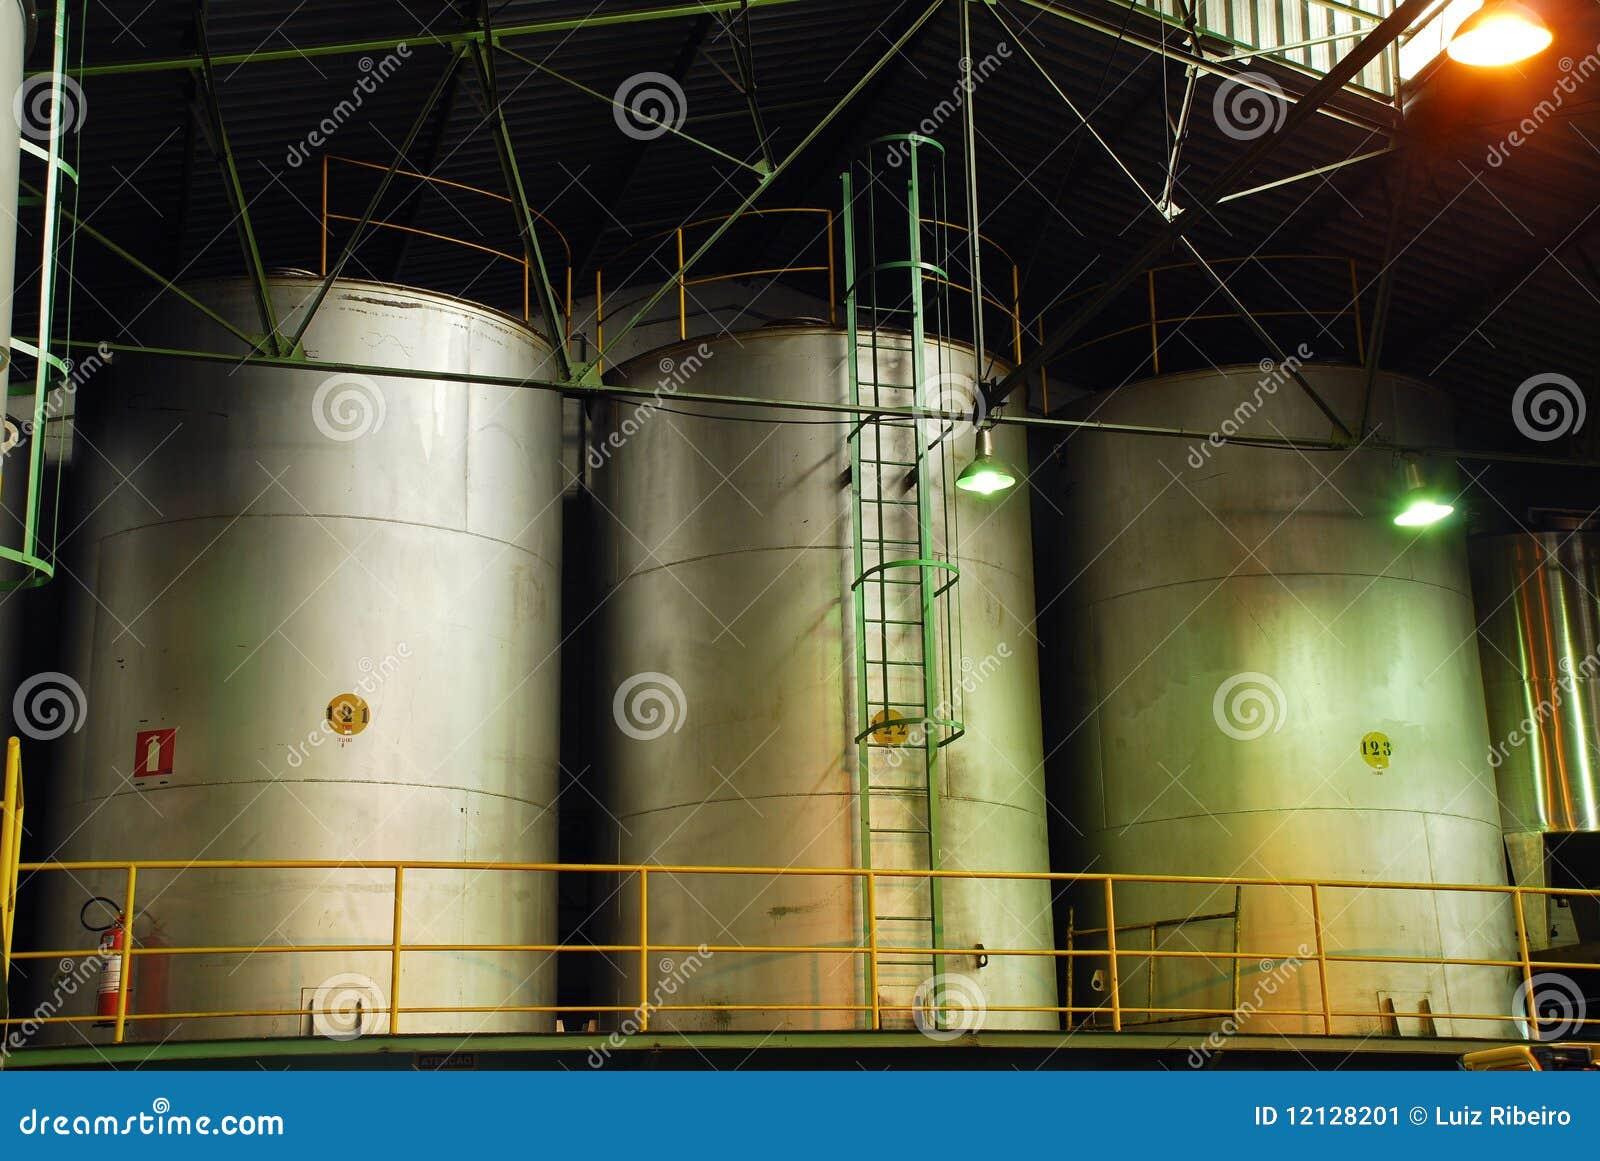 Petroleum Stock Image Image 12128201